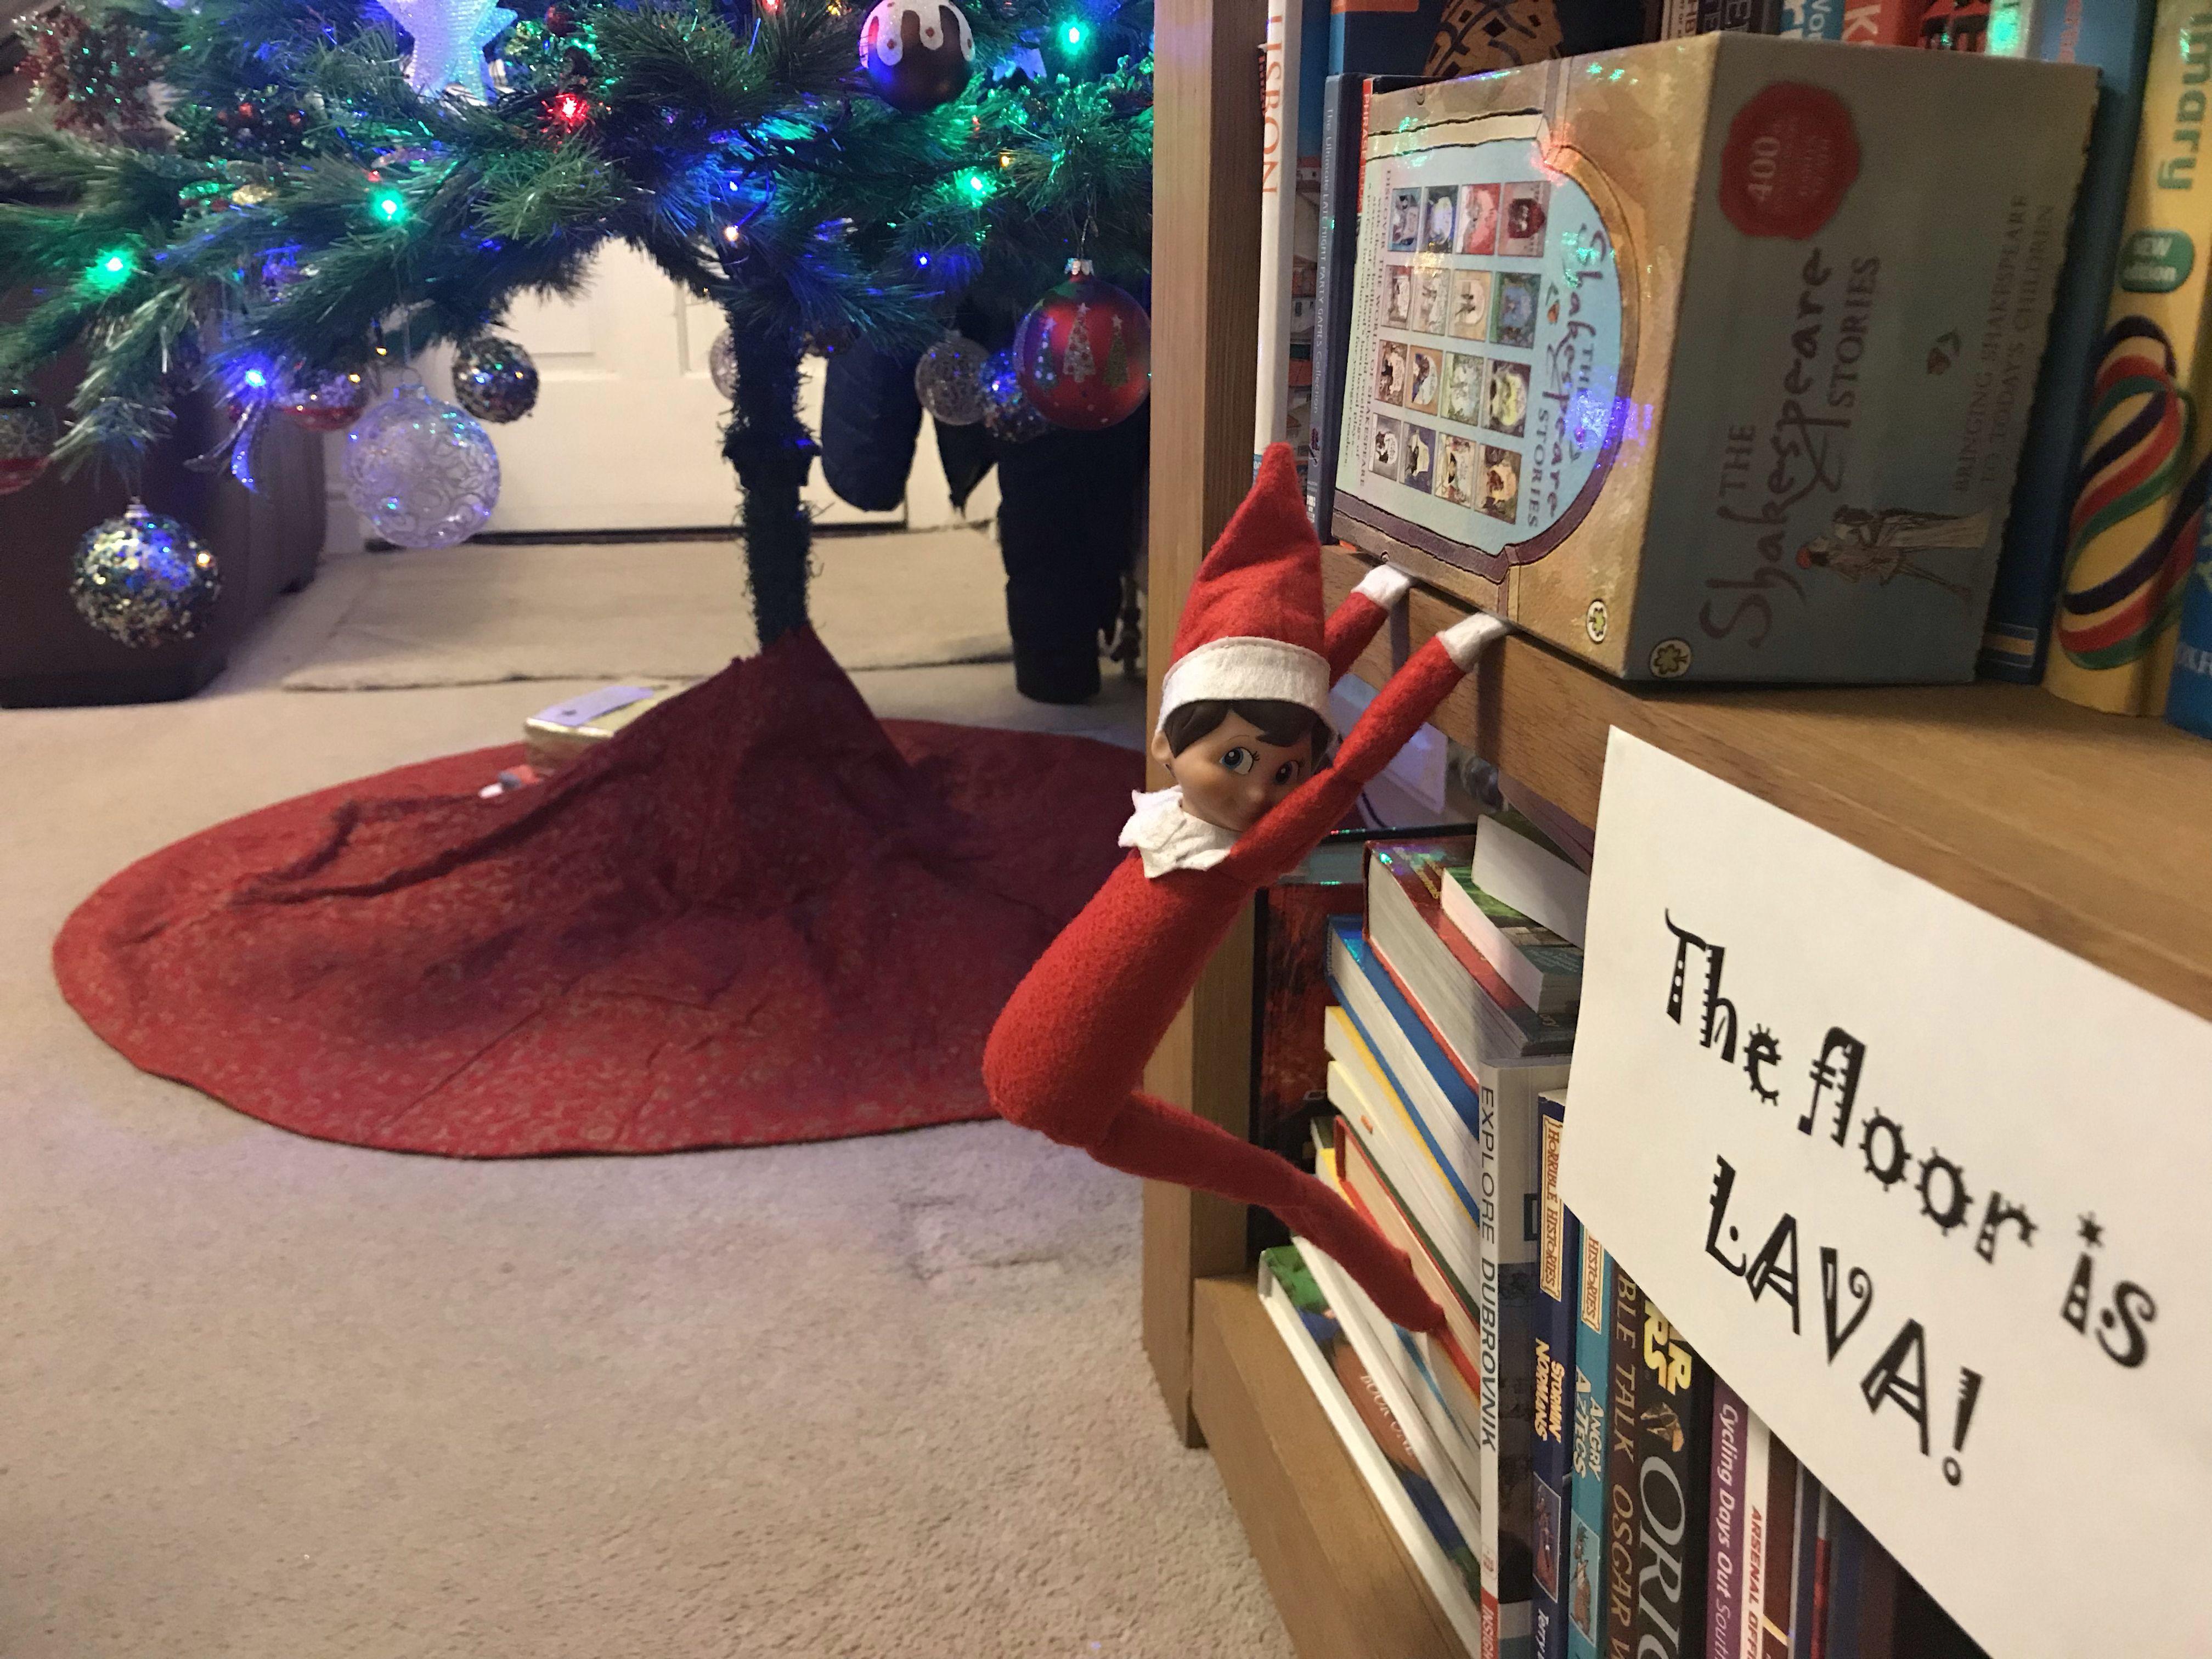 Pin By Marissa Anders On Steve S Elf On The Shelf Christmas Elf Naughty Elf Elf